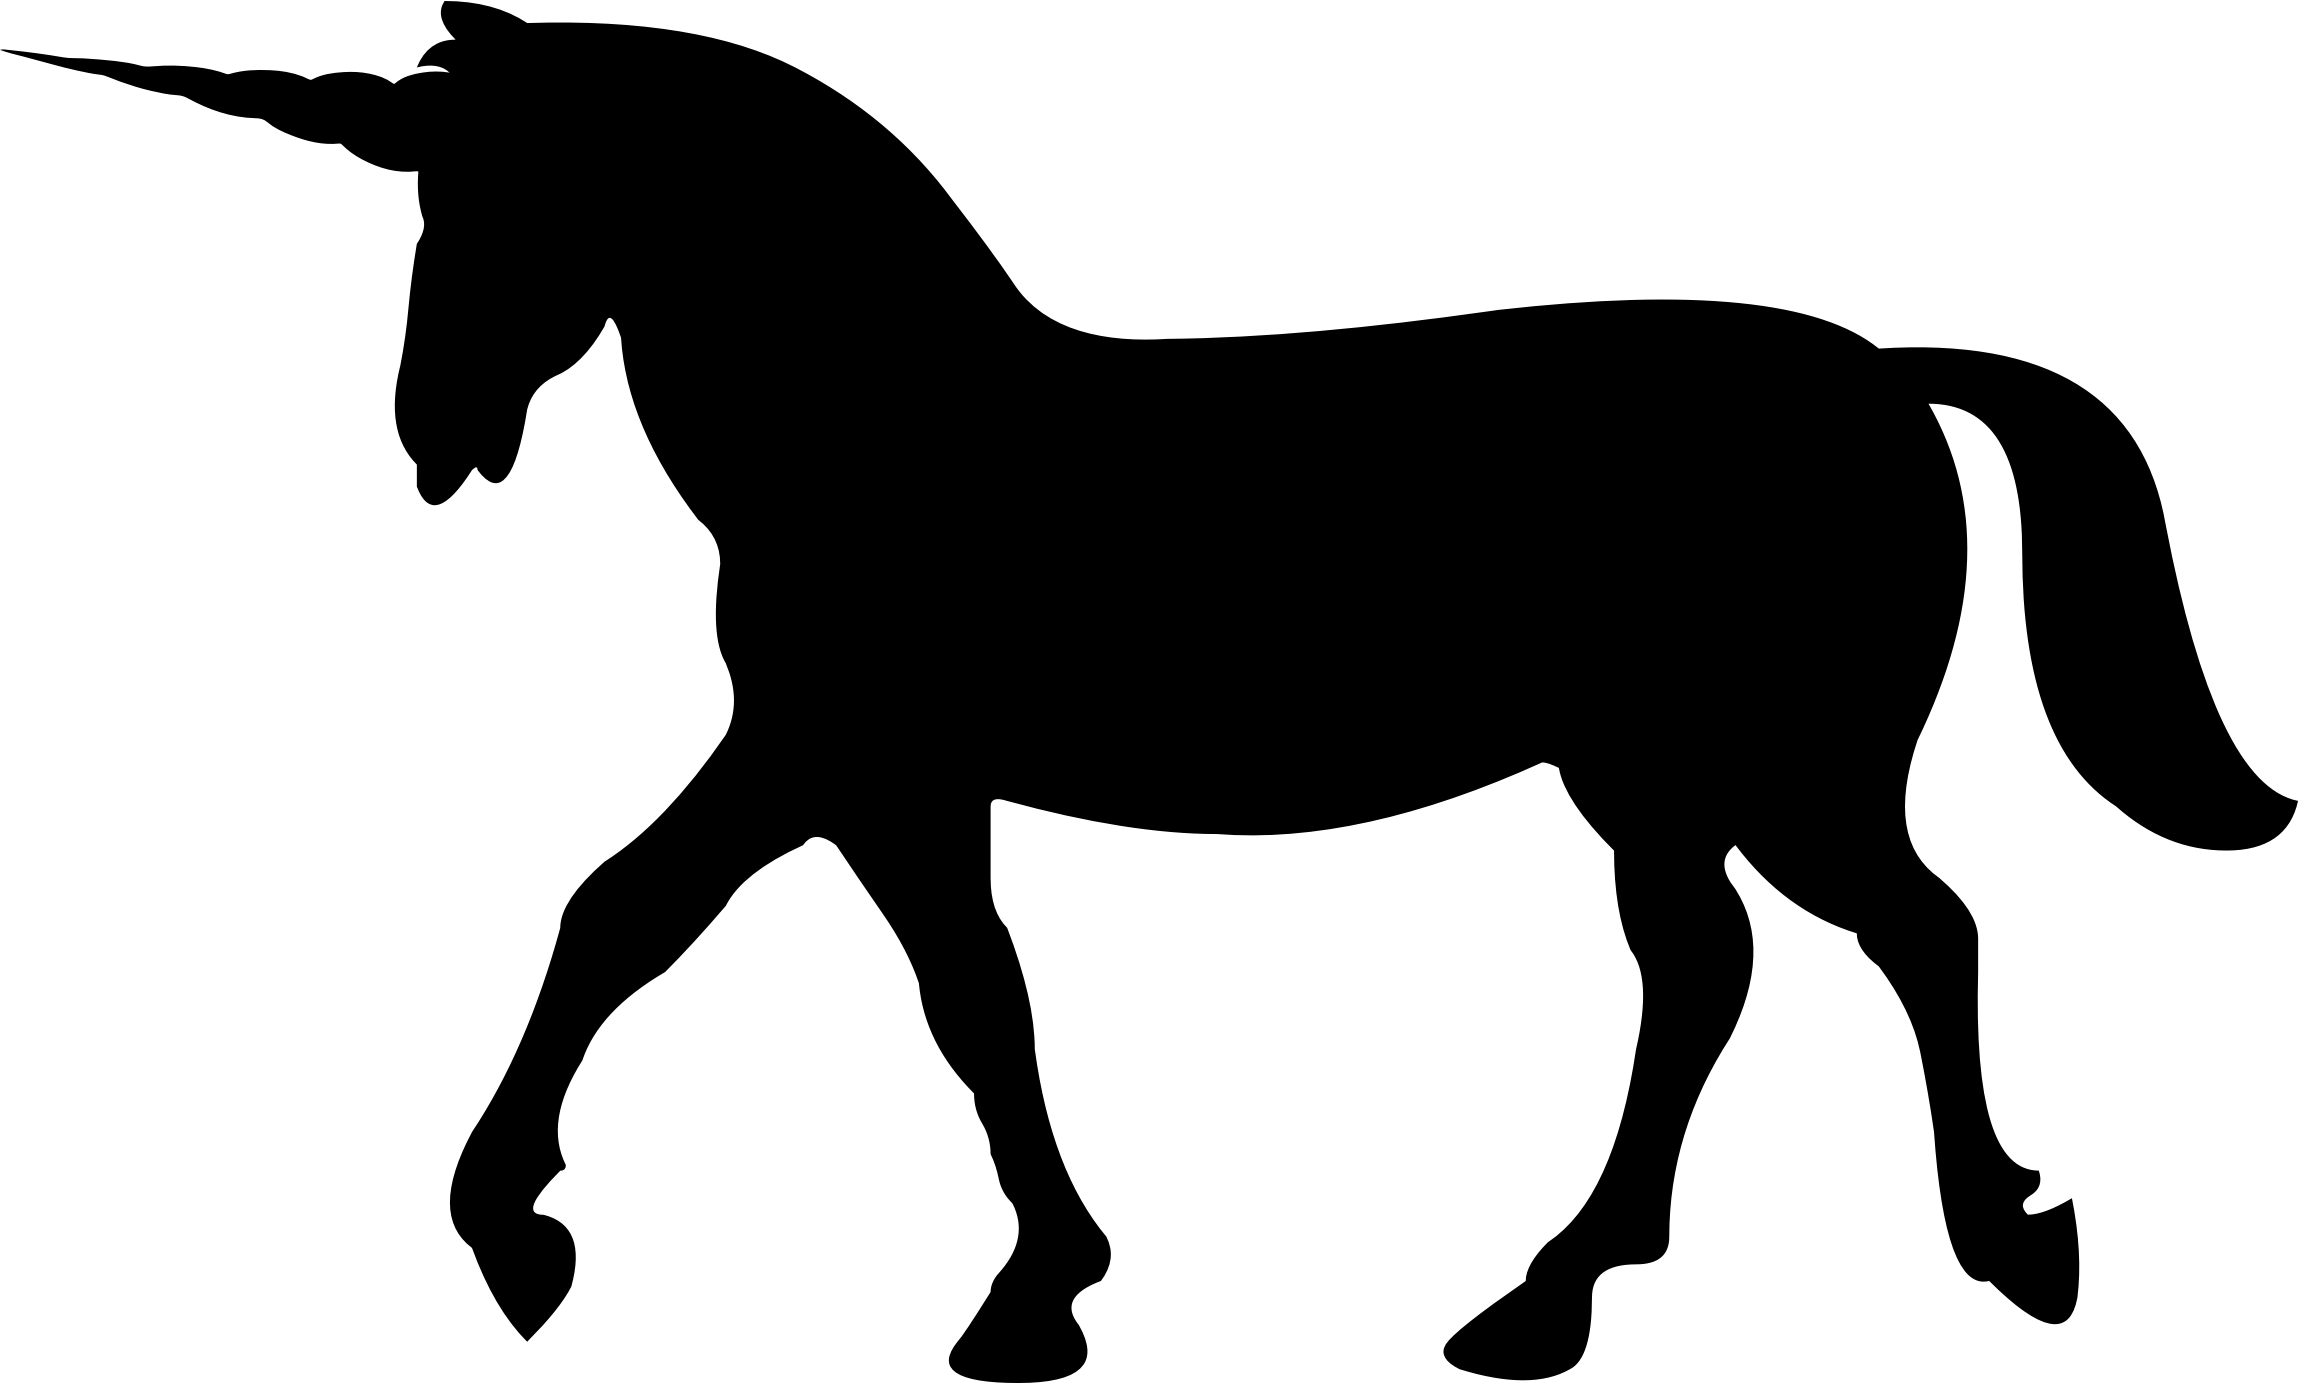 Unicorn PNG - 20448